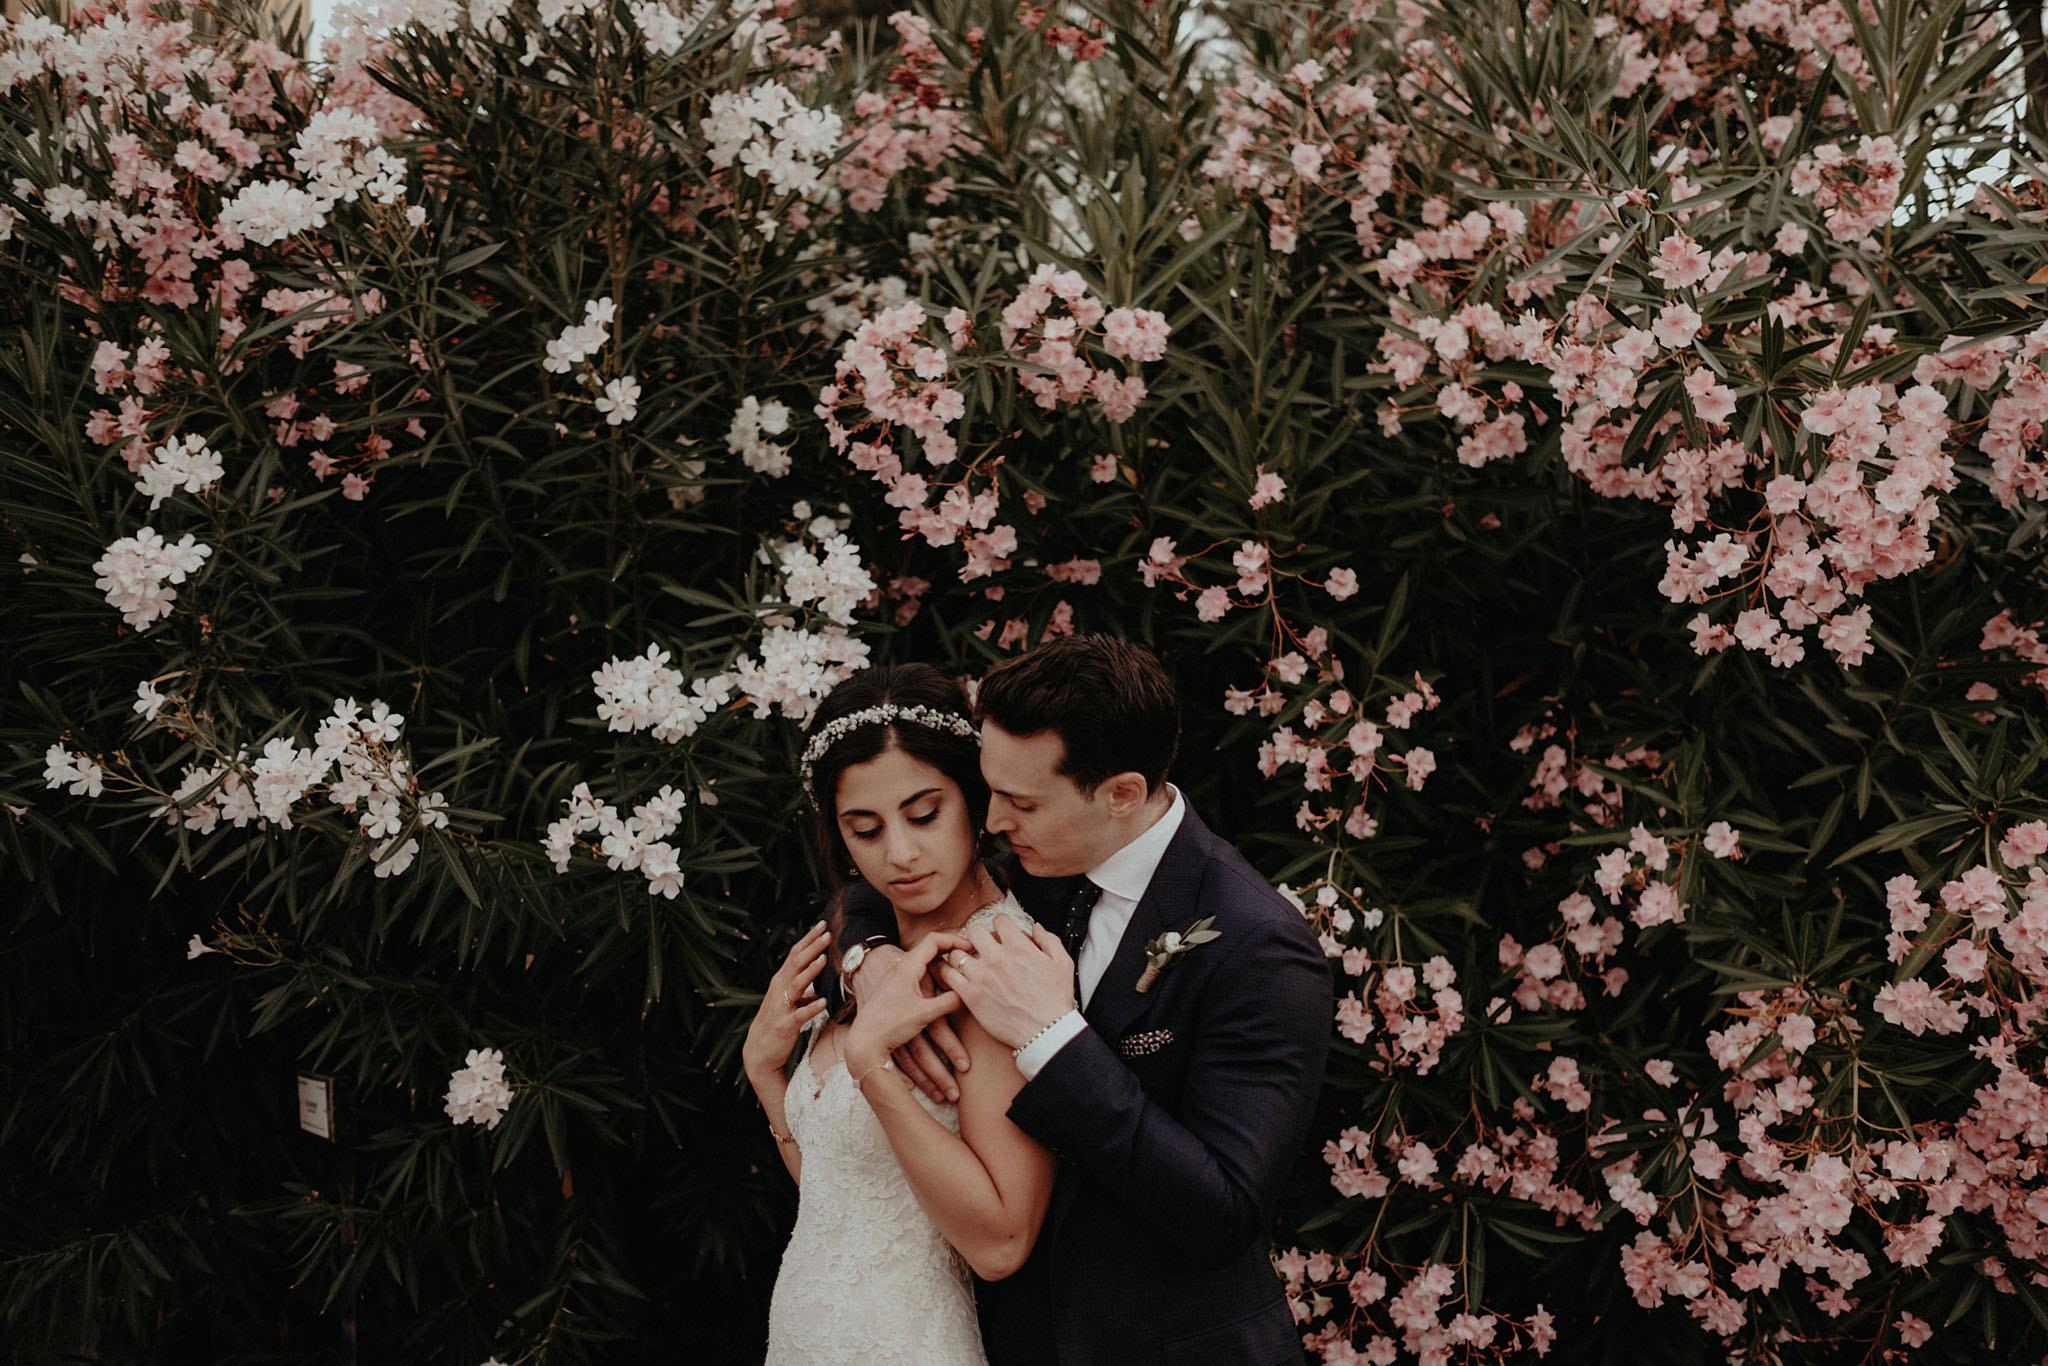 Max-Steph-Italy-Wedding-609.jpg